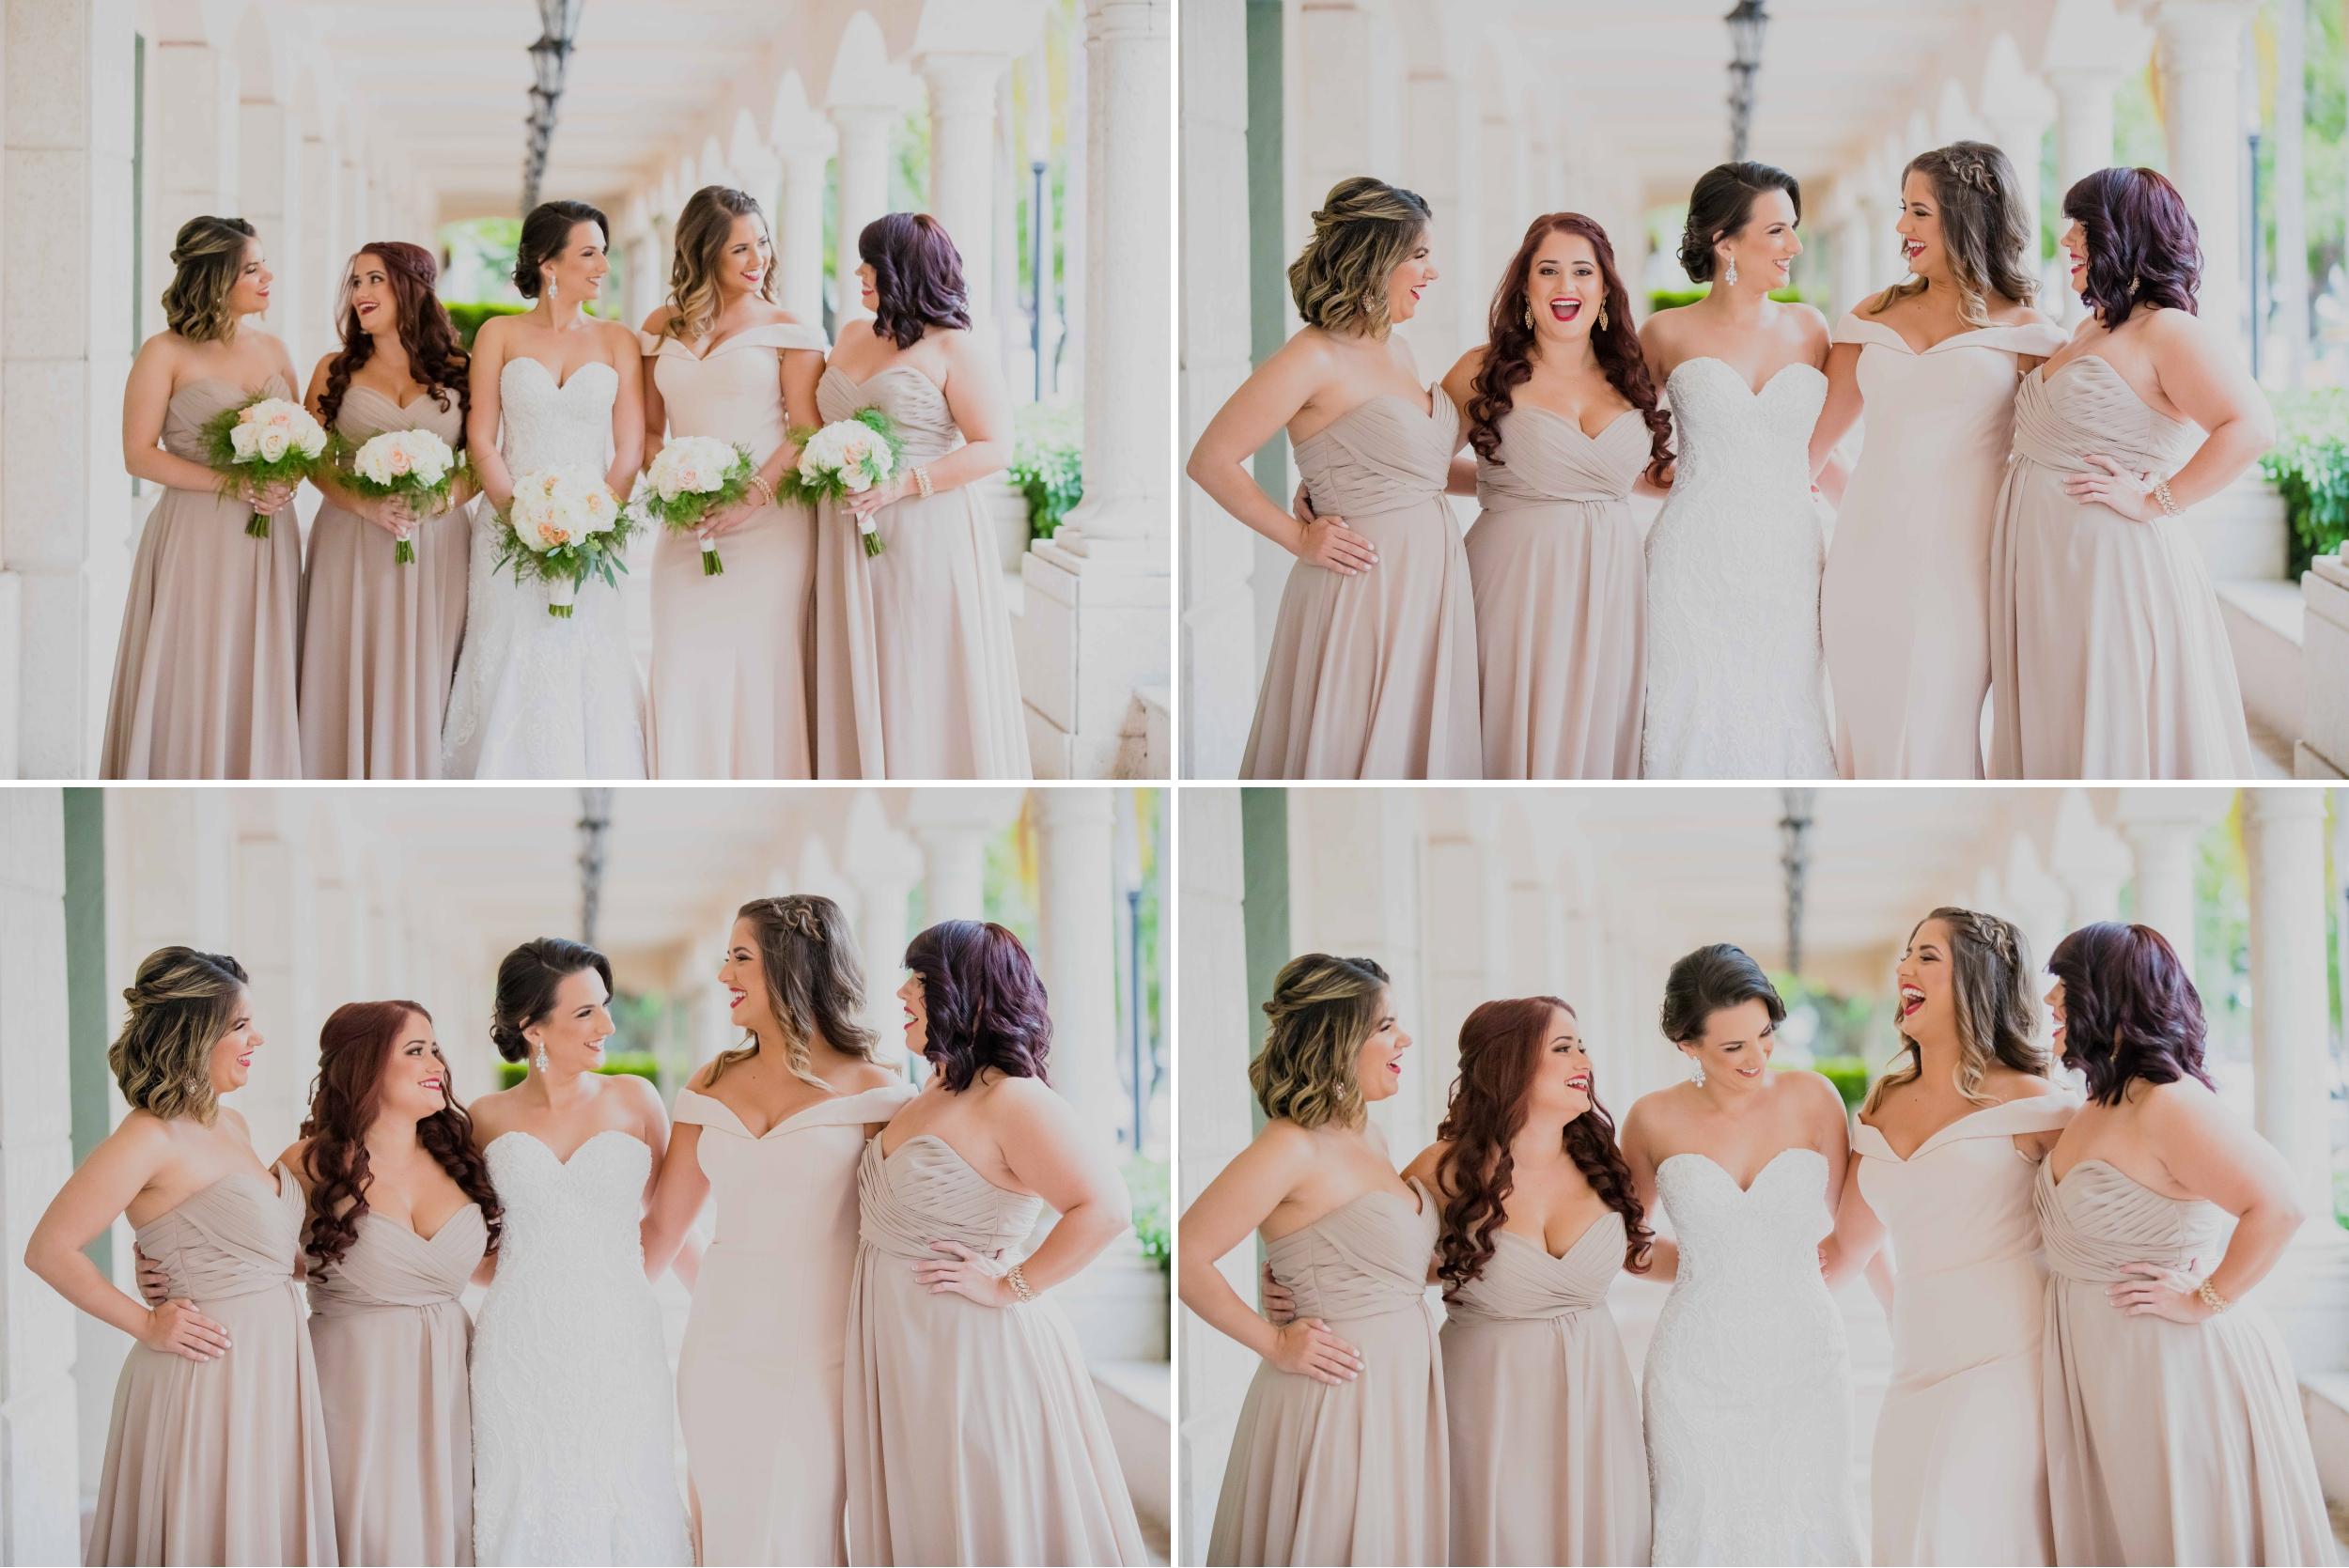 Wedding - Coco Plum - Coral Gables Congregational - Santy Martinez Photography 11.jpg